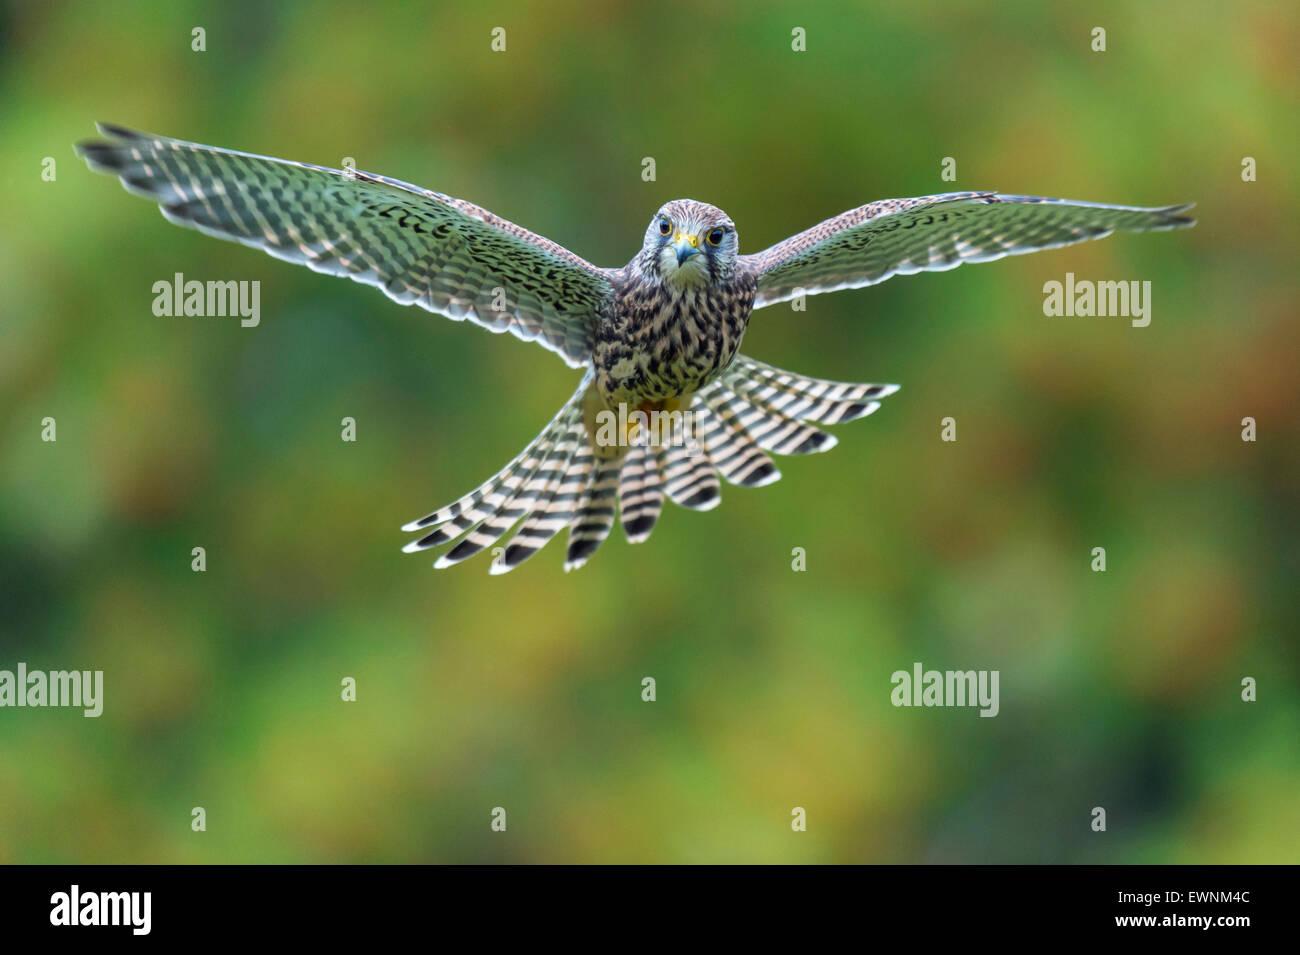 common kestrel, falco tinnunculus, oldenburger münsterland, niedersachsen, germany - Stock Image